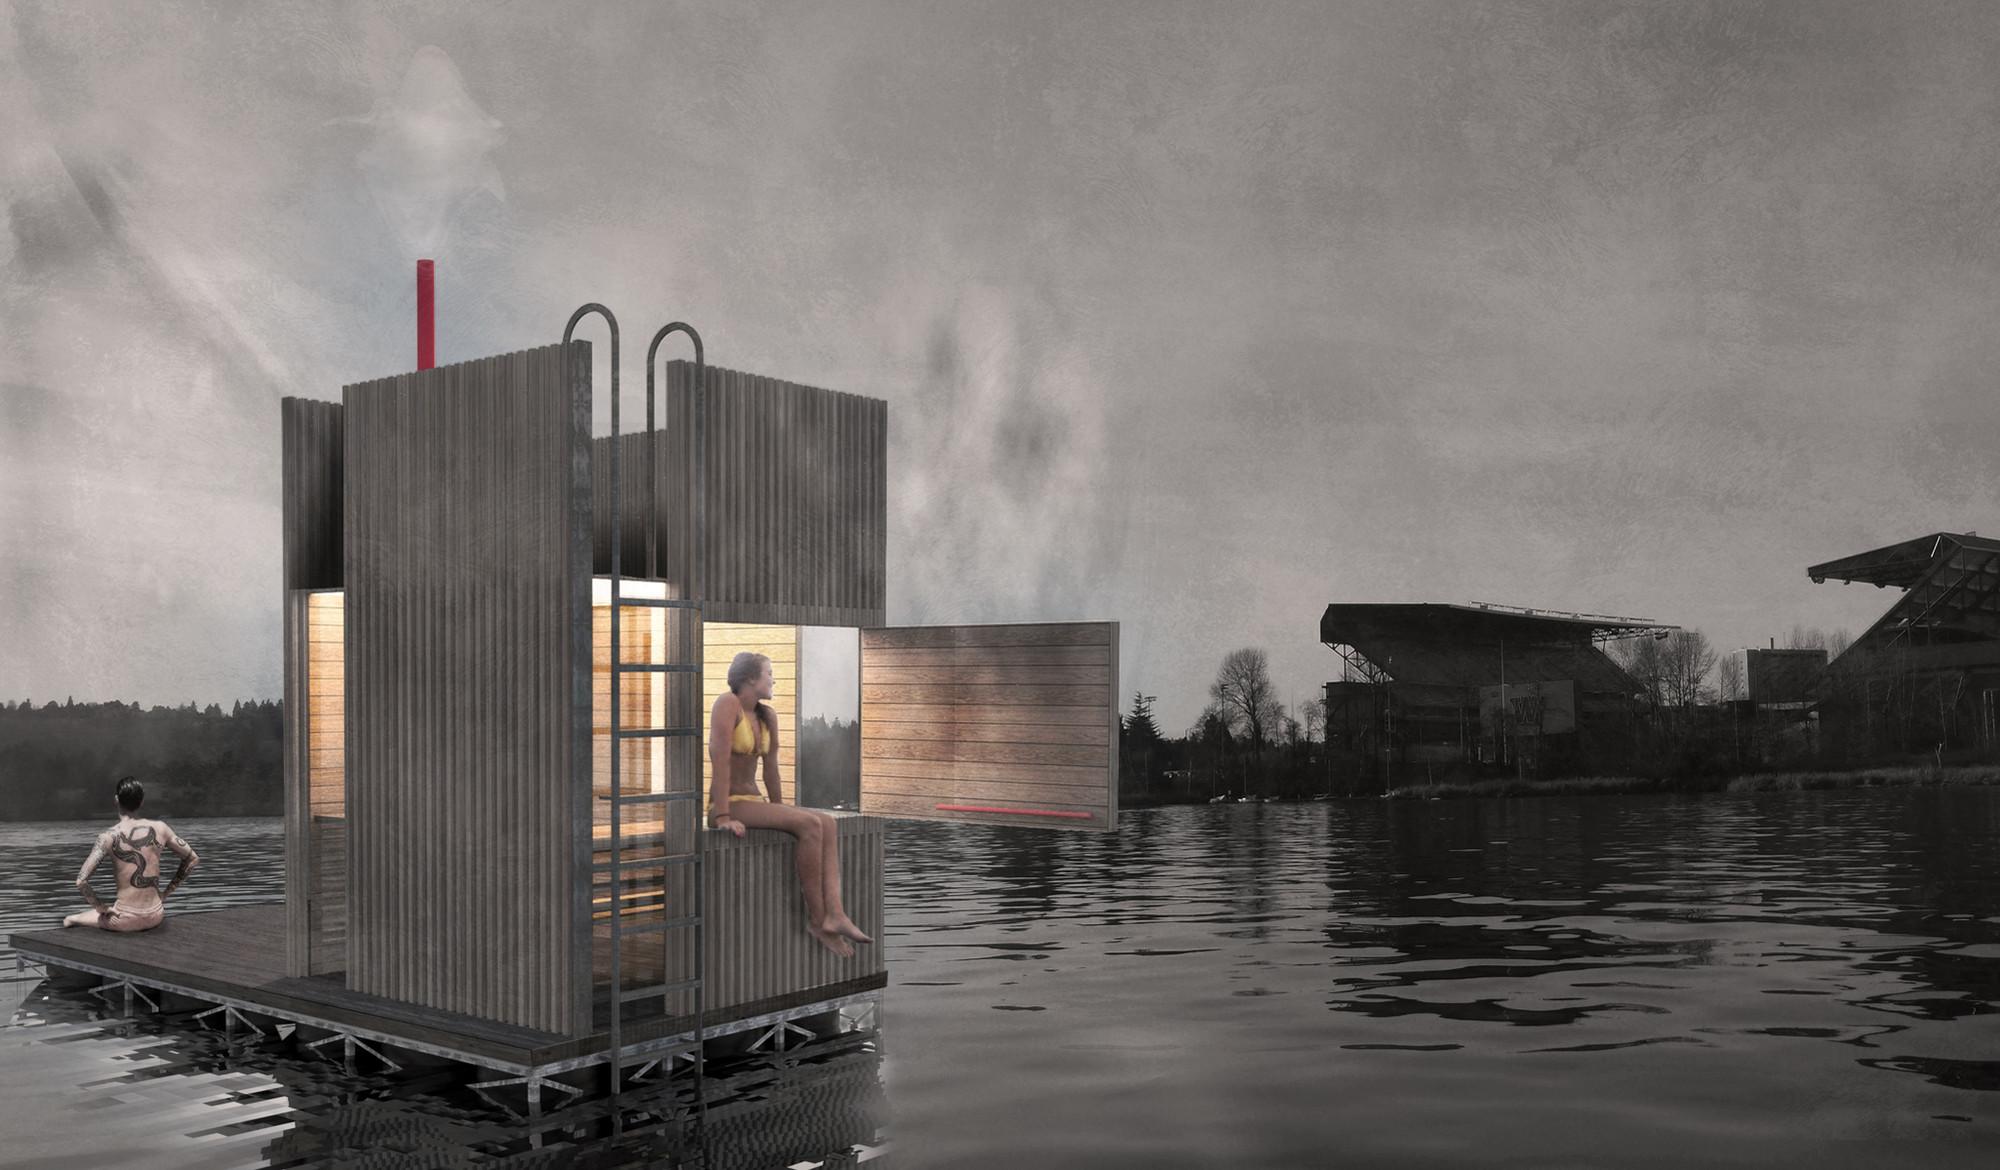 goCstudio Launches New Kickstarter to Fund Floating Sauna in Seattle